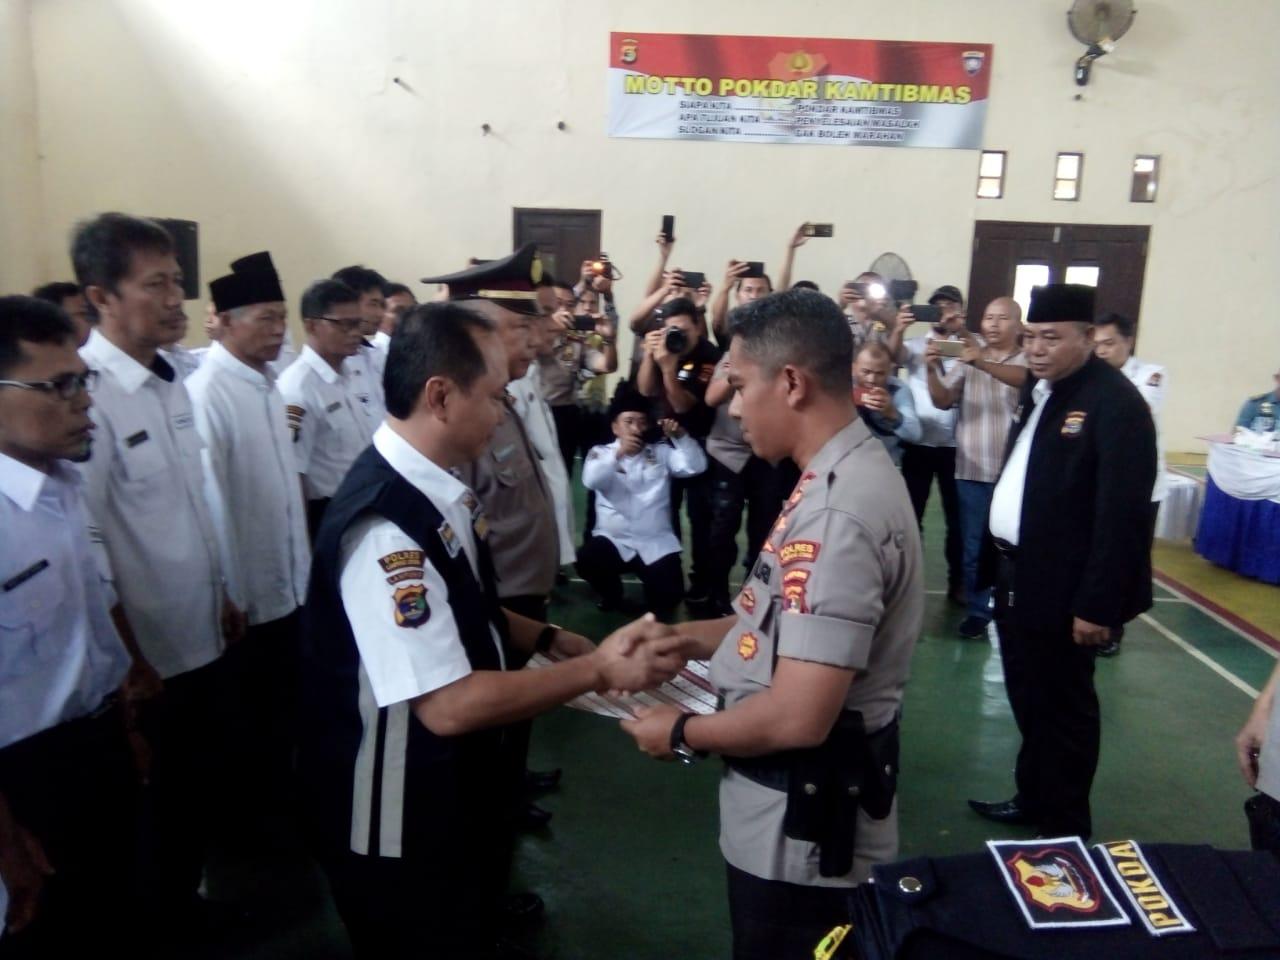 Tingkatan Pelayanan, Kapolres Lampung Utara Canangkan WBK Dan WBBM